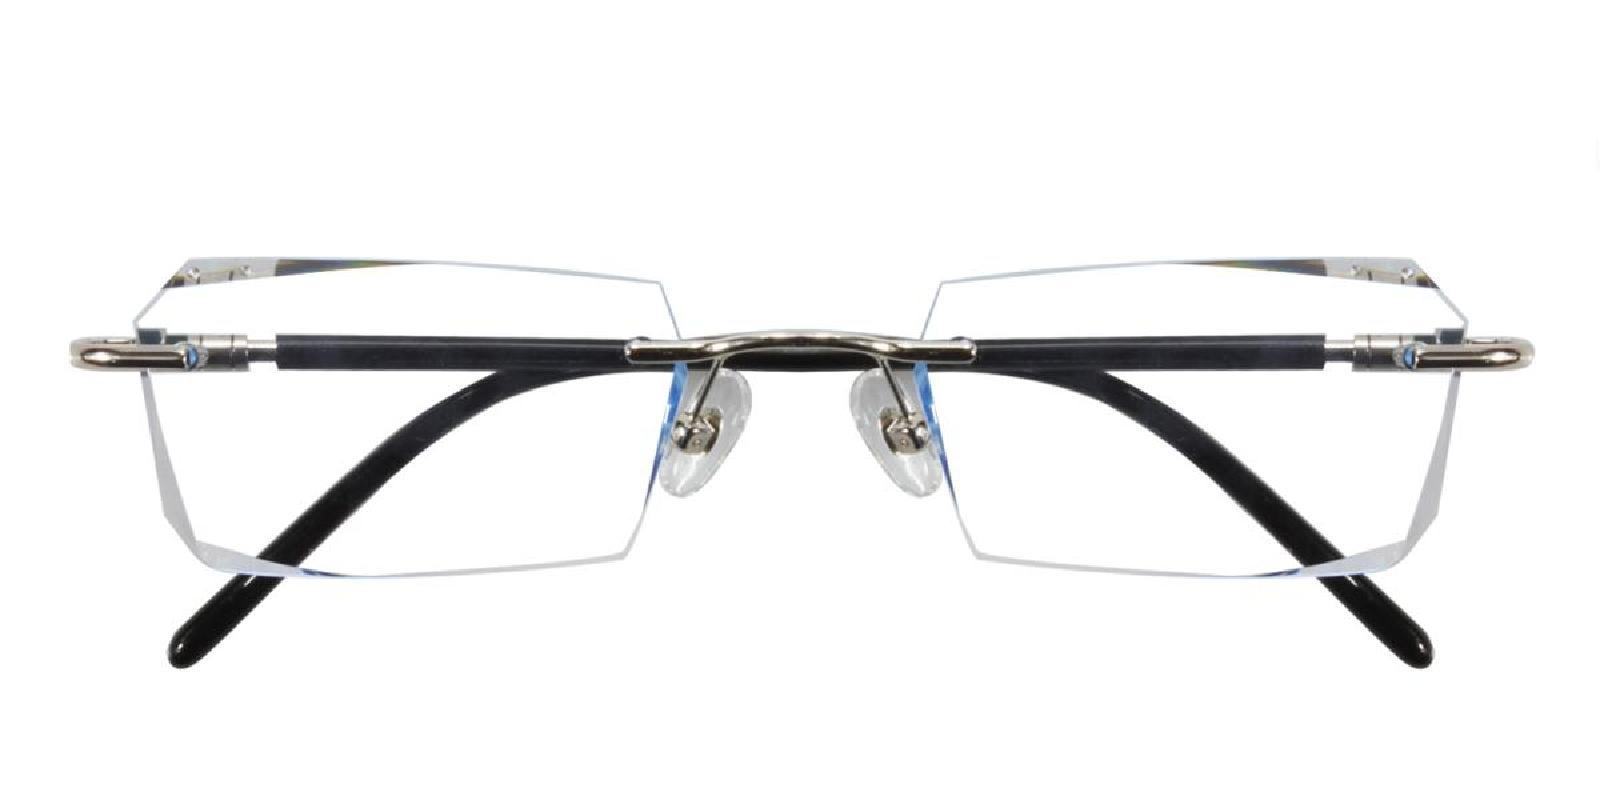 Thomas-Silver-Varieties-Titanium-Eyeglasses-additional2